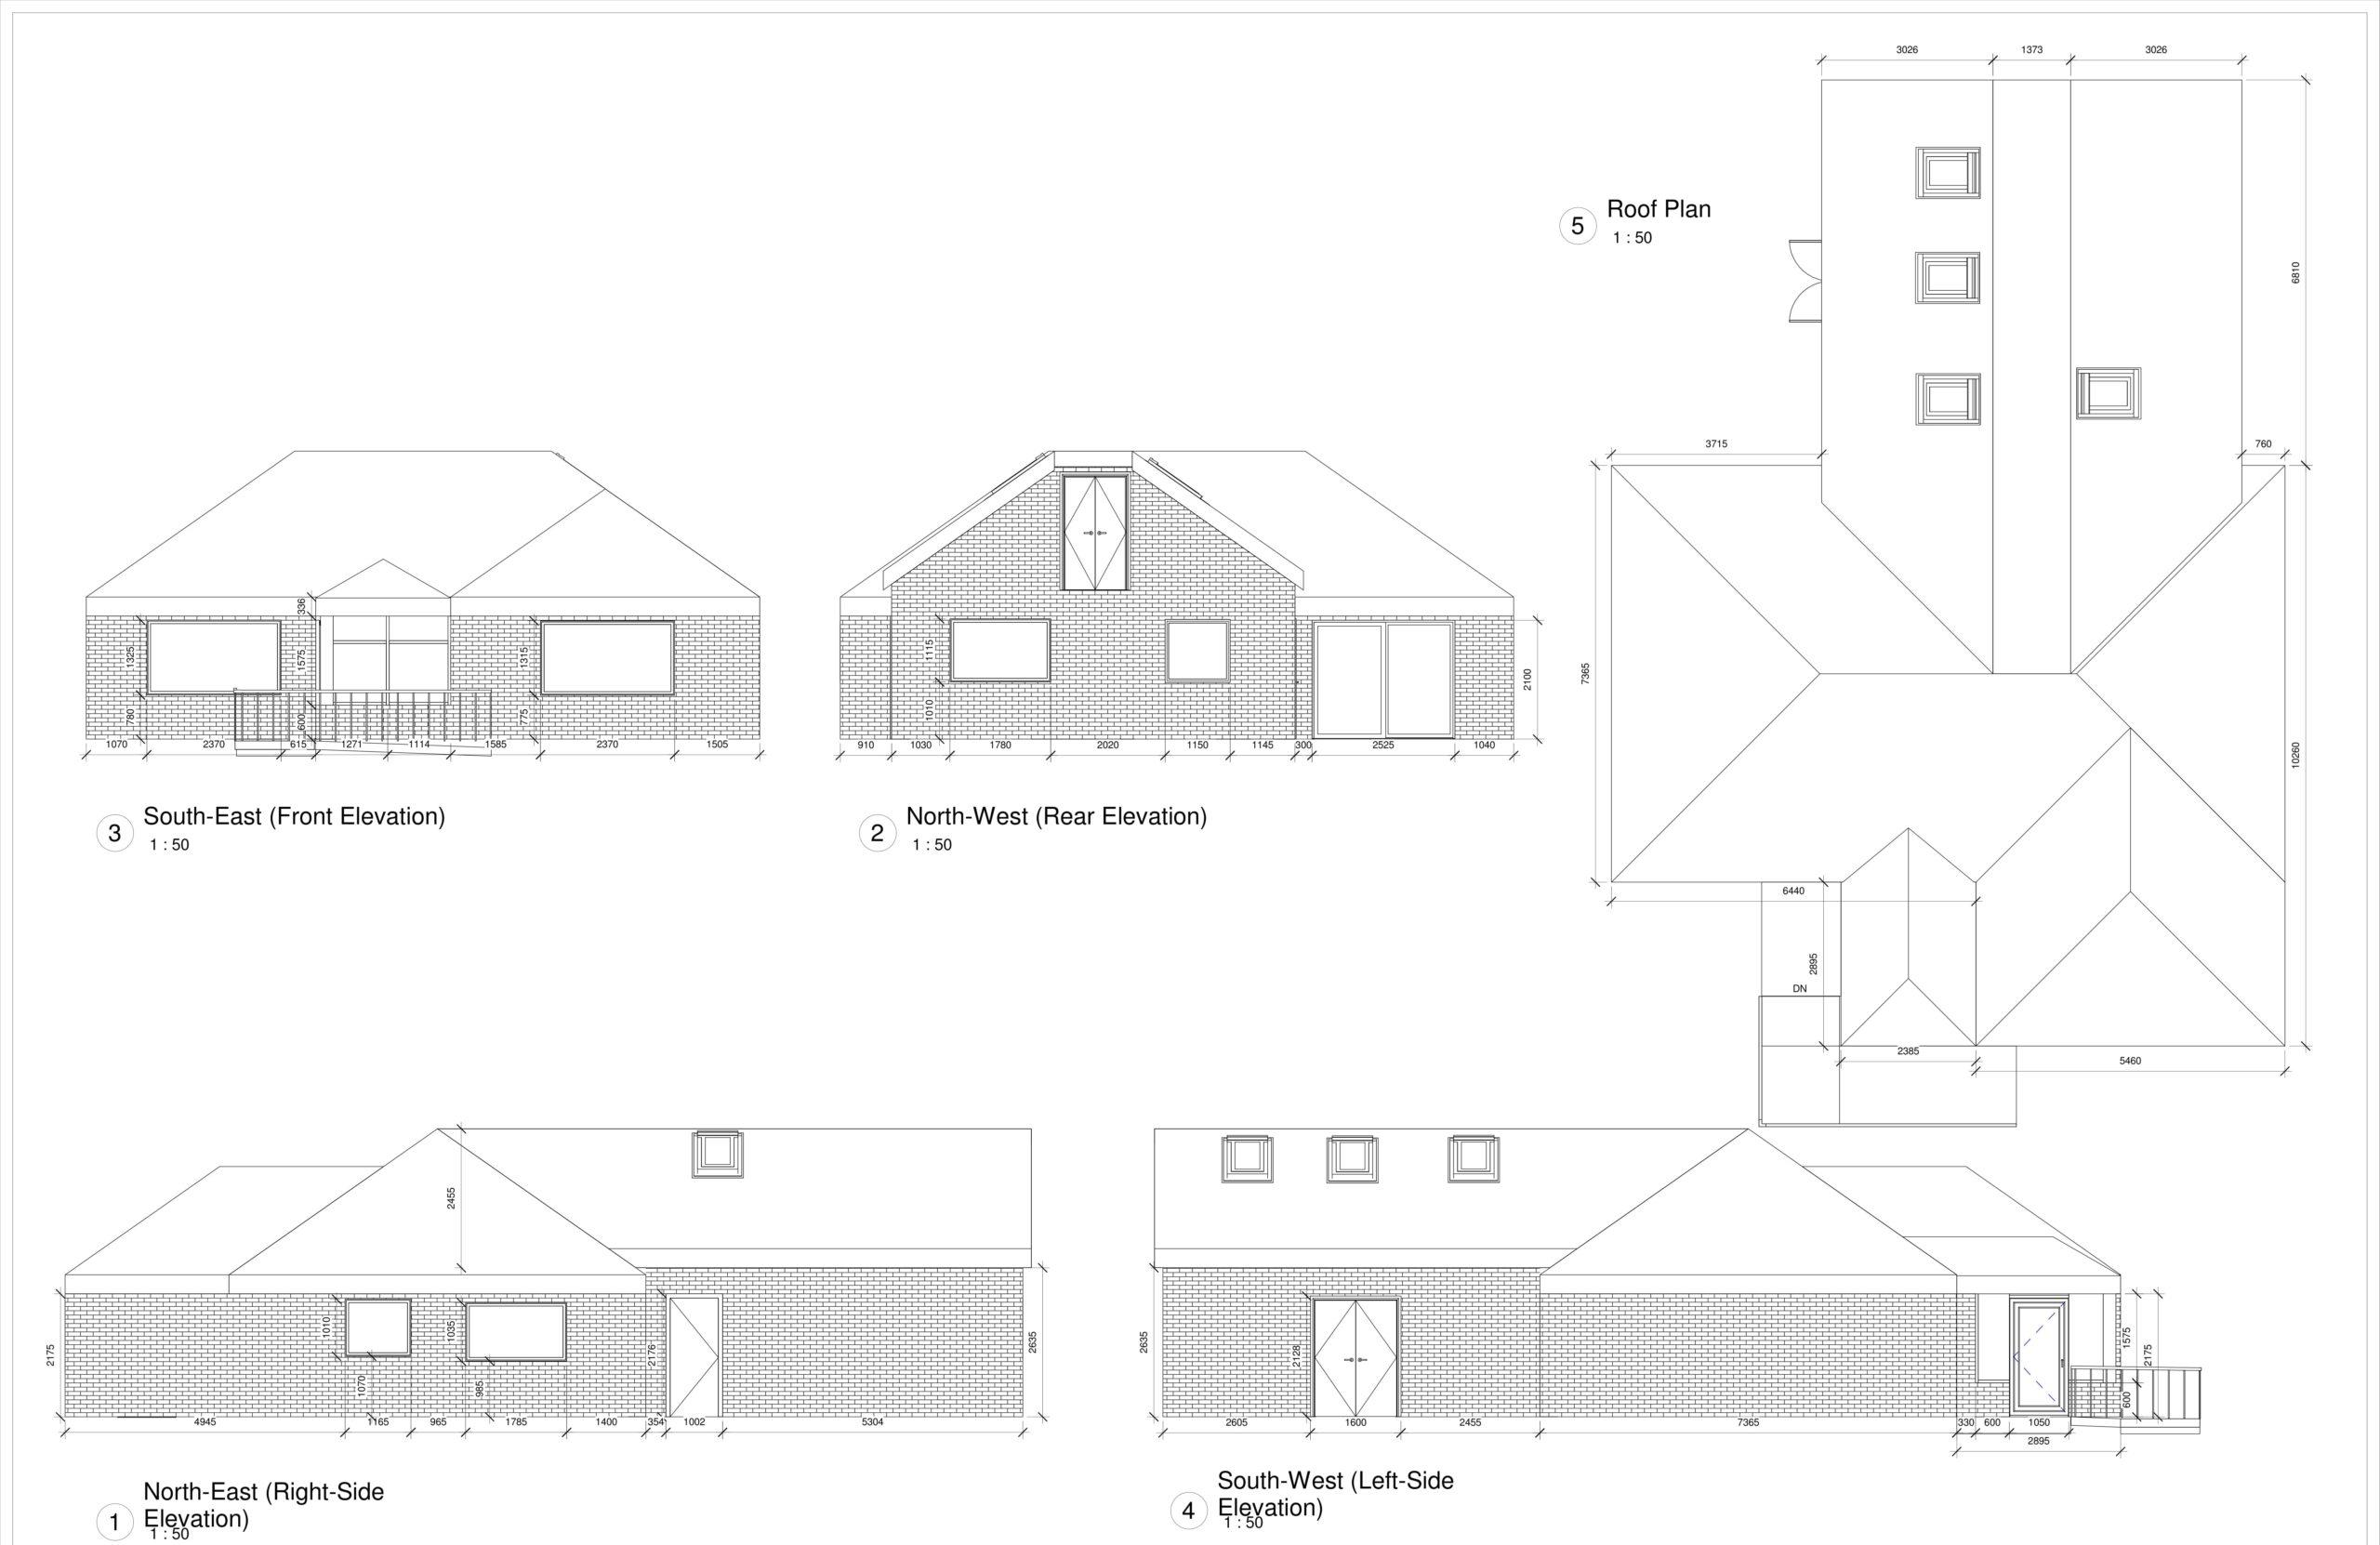 Canterbury Road, Ashford – Front Porch Extension